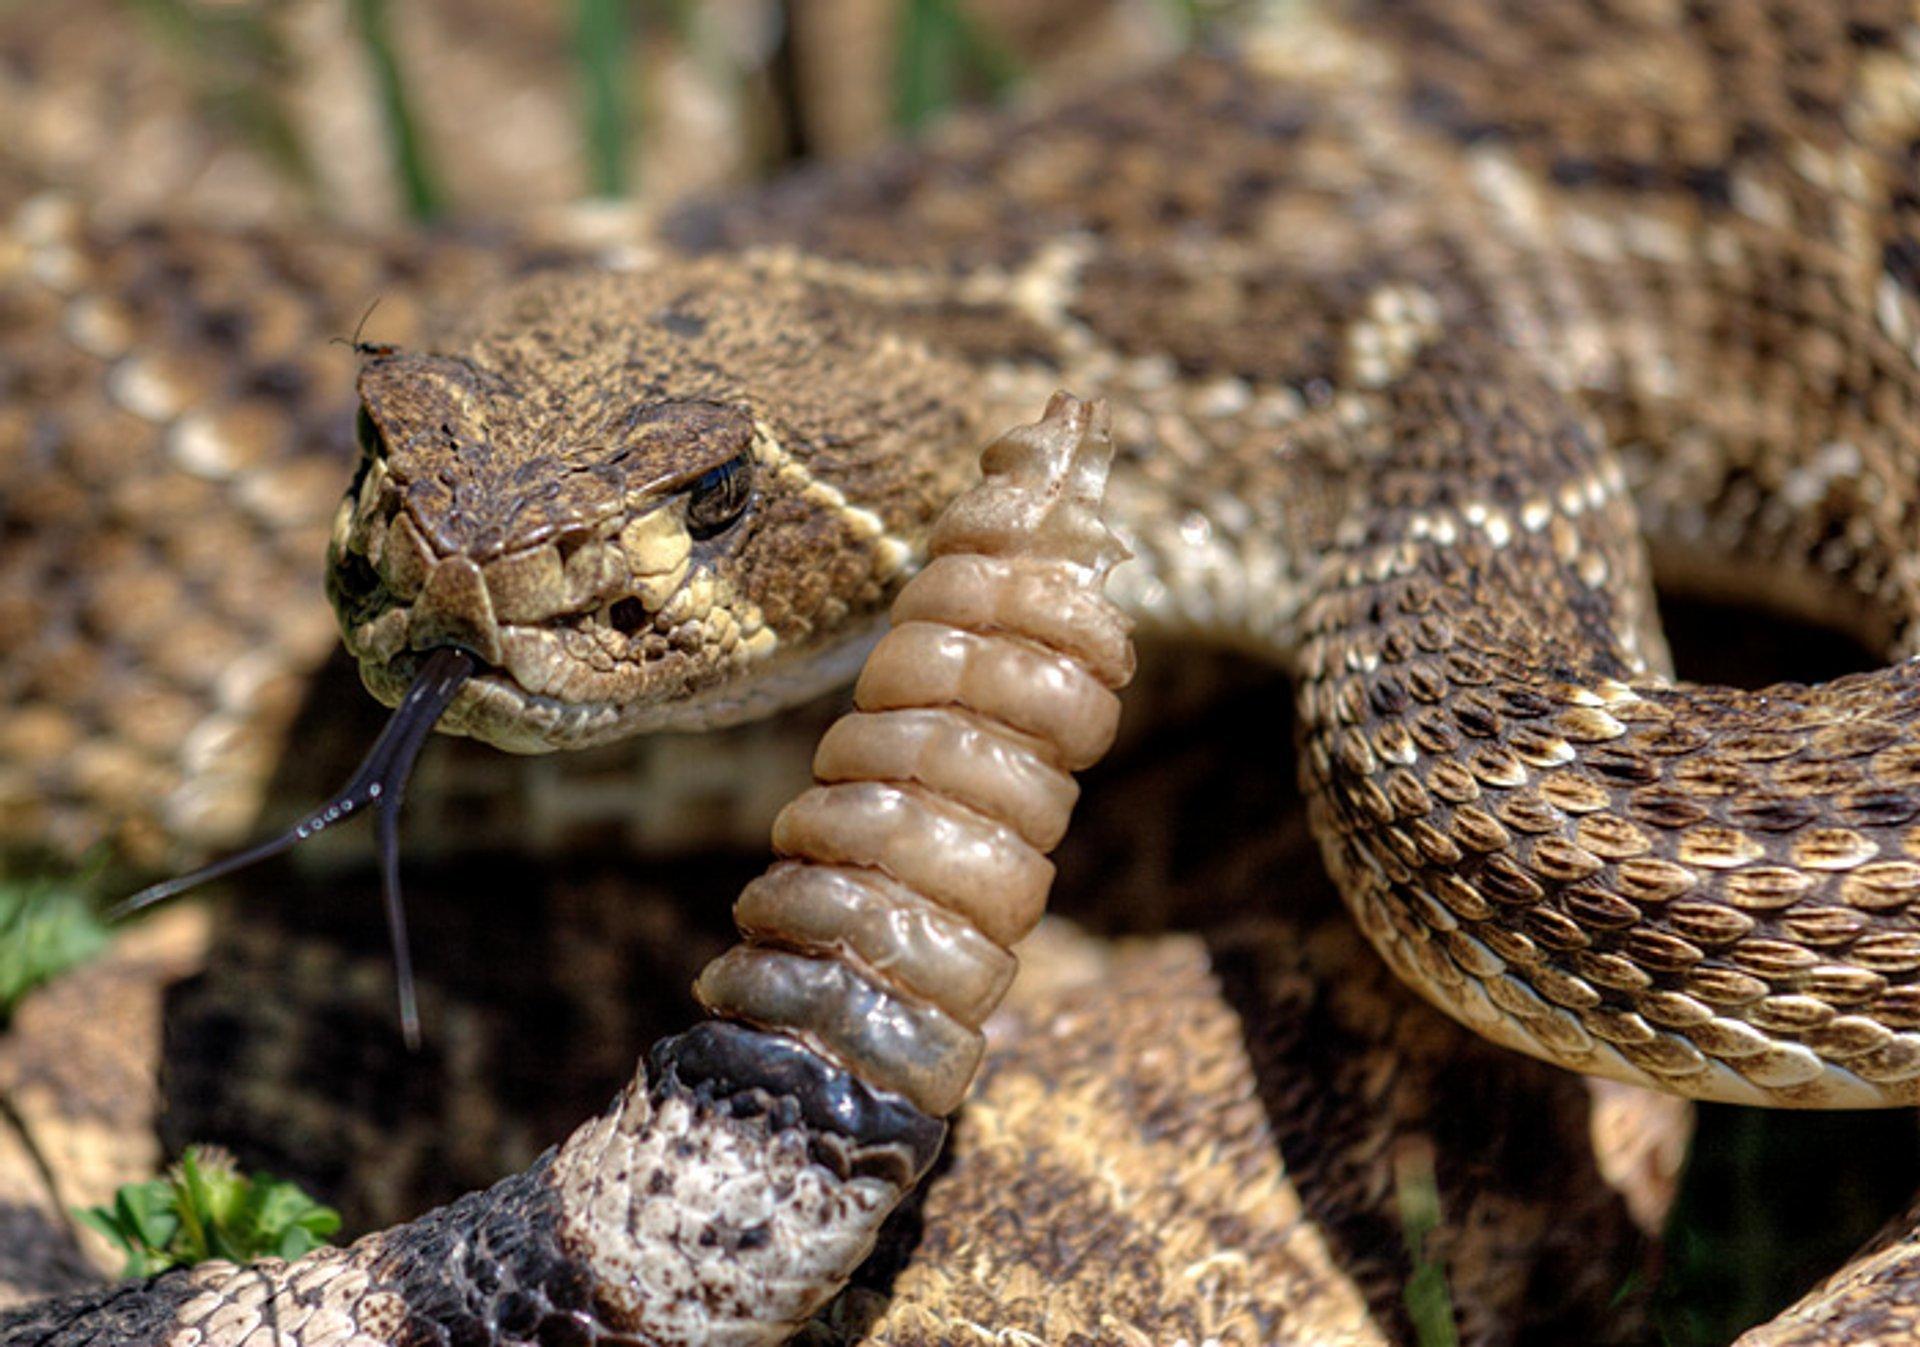 Western Diamondback Rattlesnake 2020